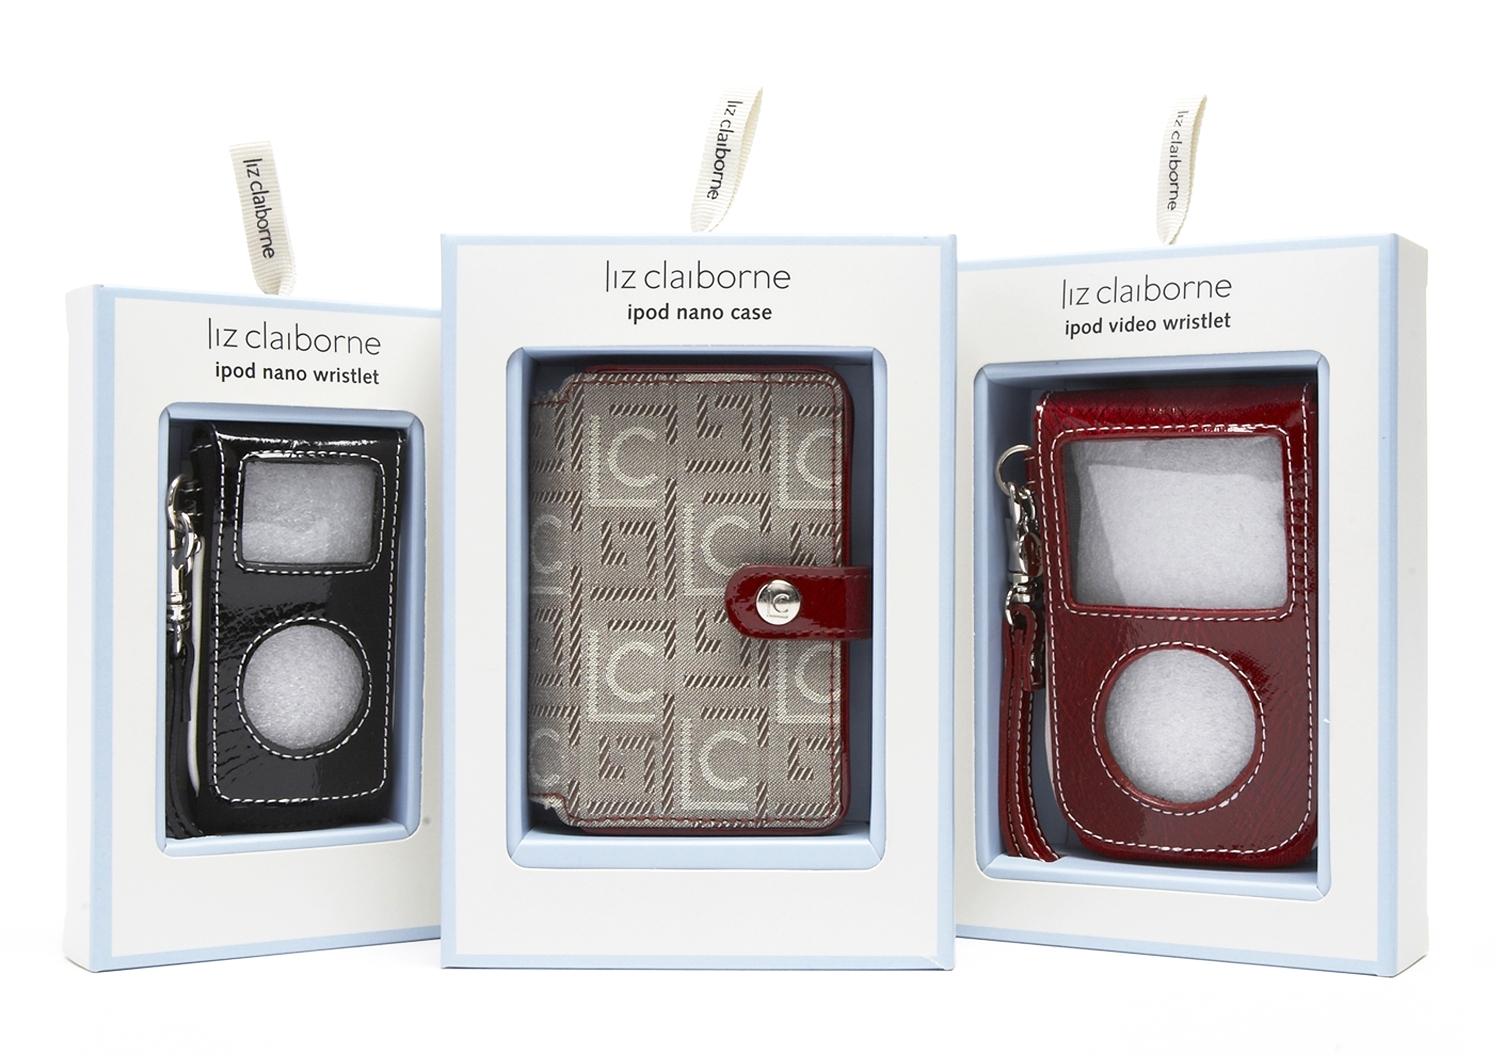 Liz Claiborne/Best Buy Packaging